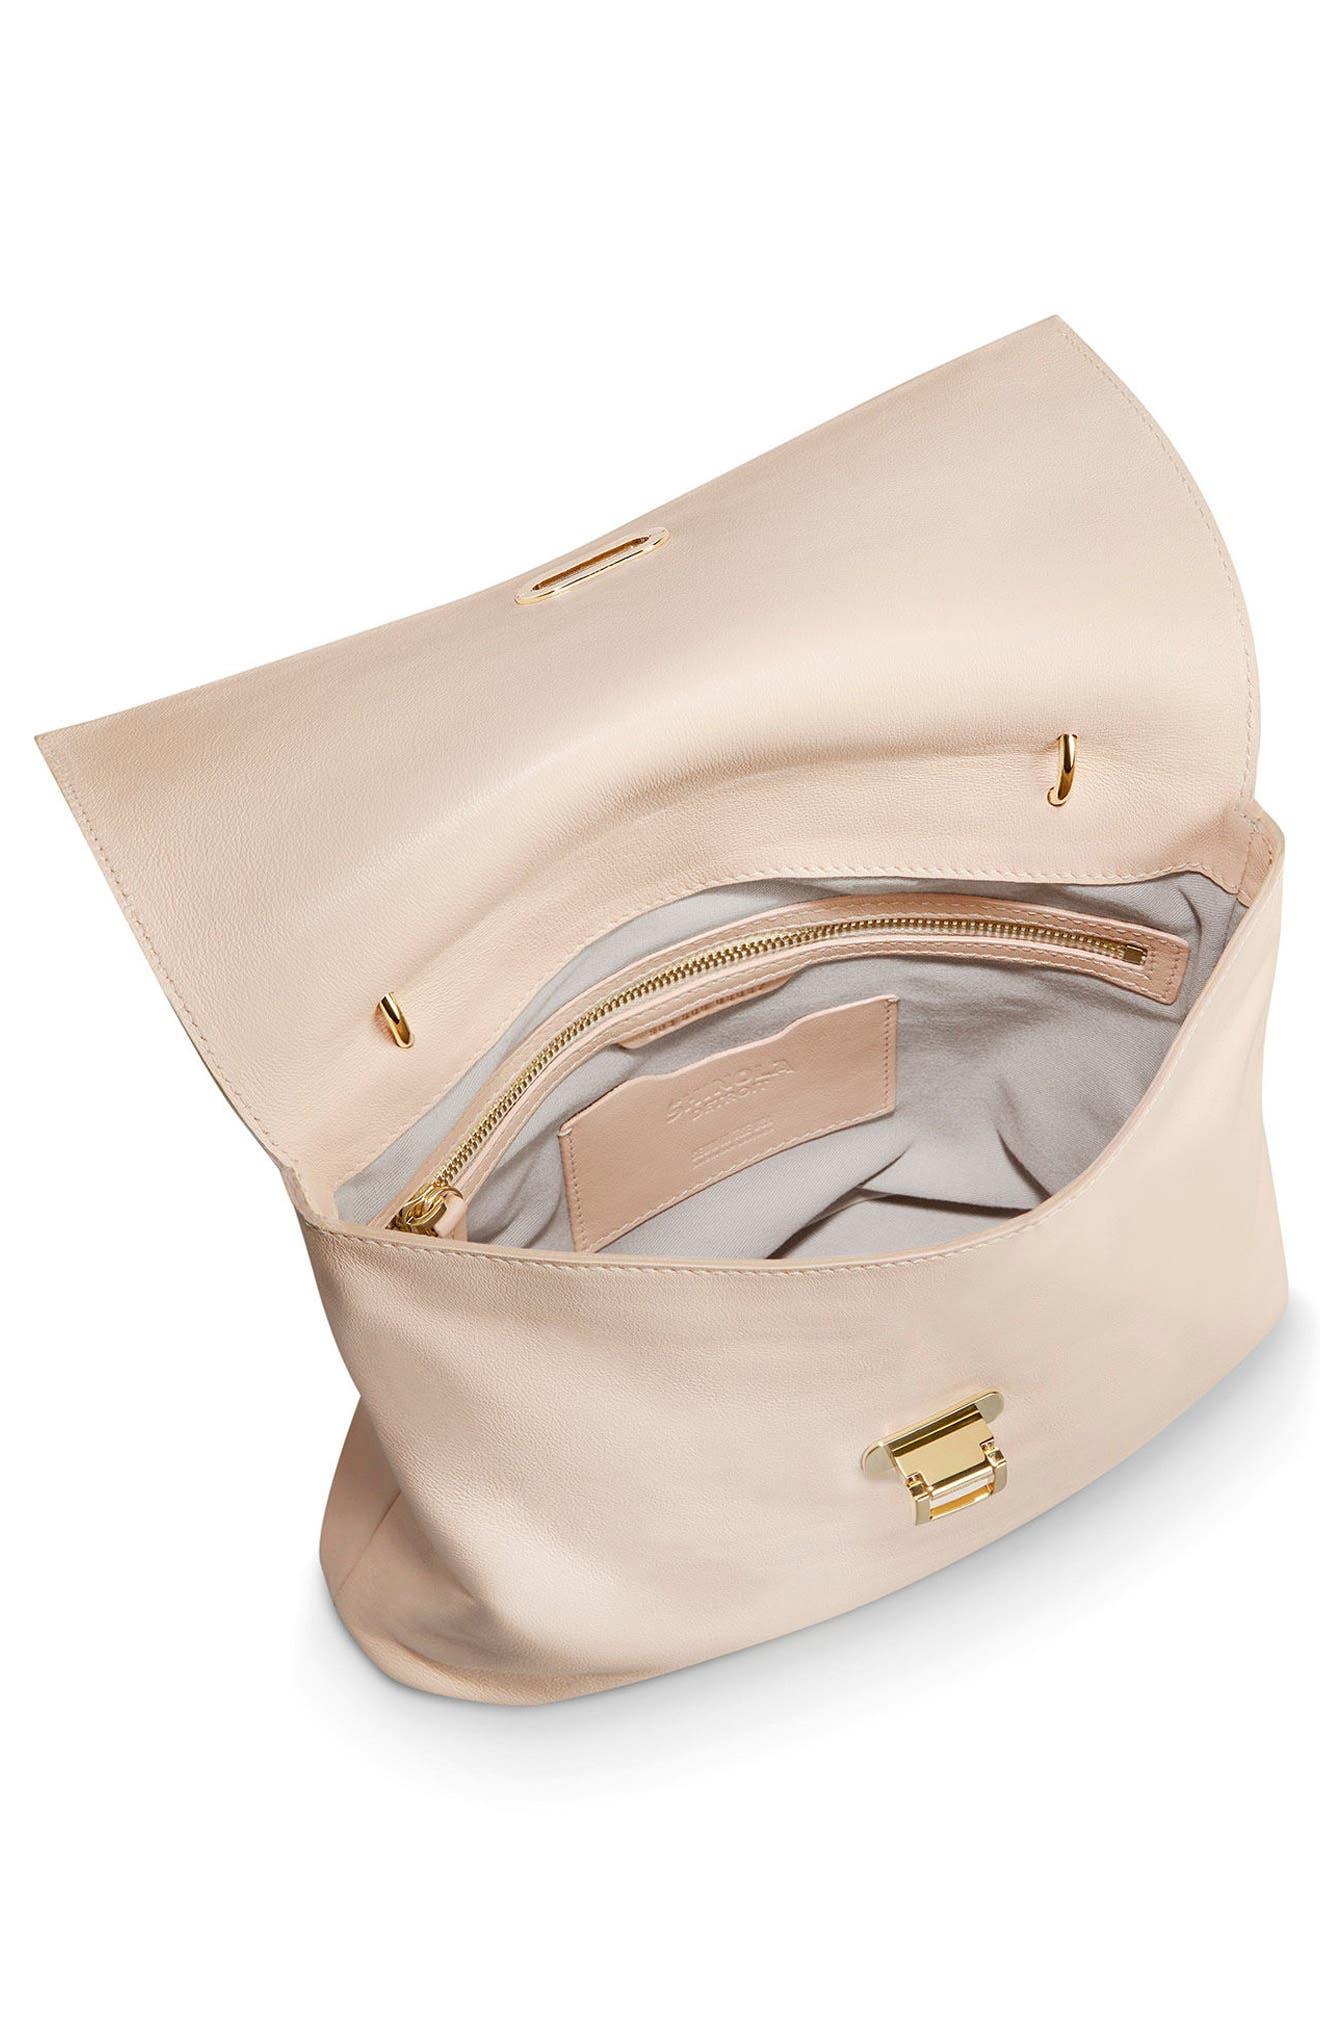 Birdy Leather Shoulder Bag,                             Alternate thumbnail 4, color,                             SOFT BLUSH